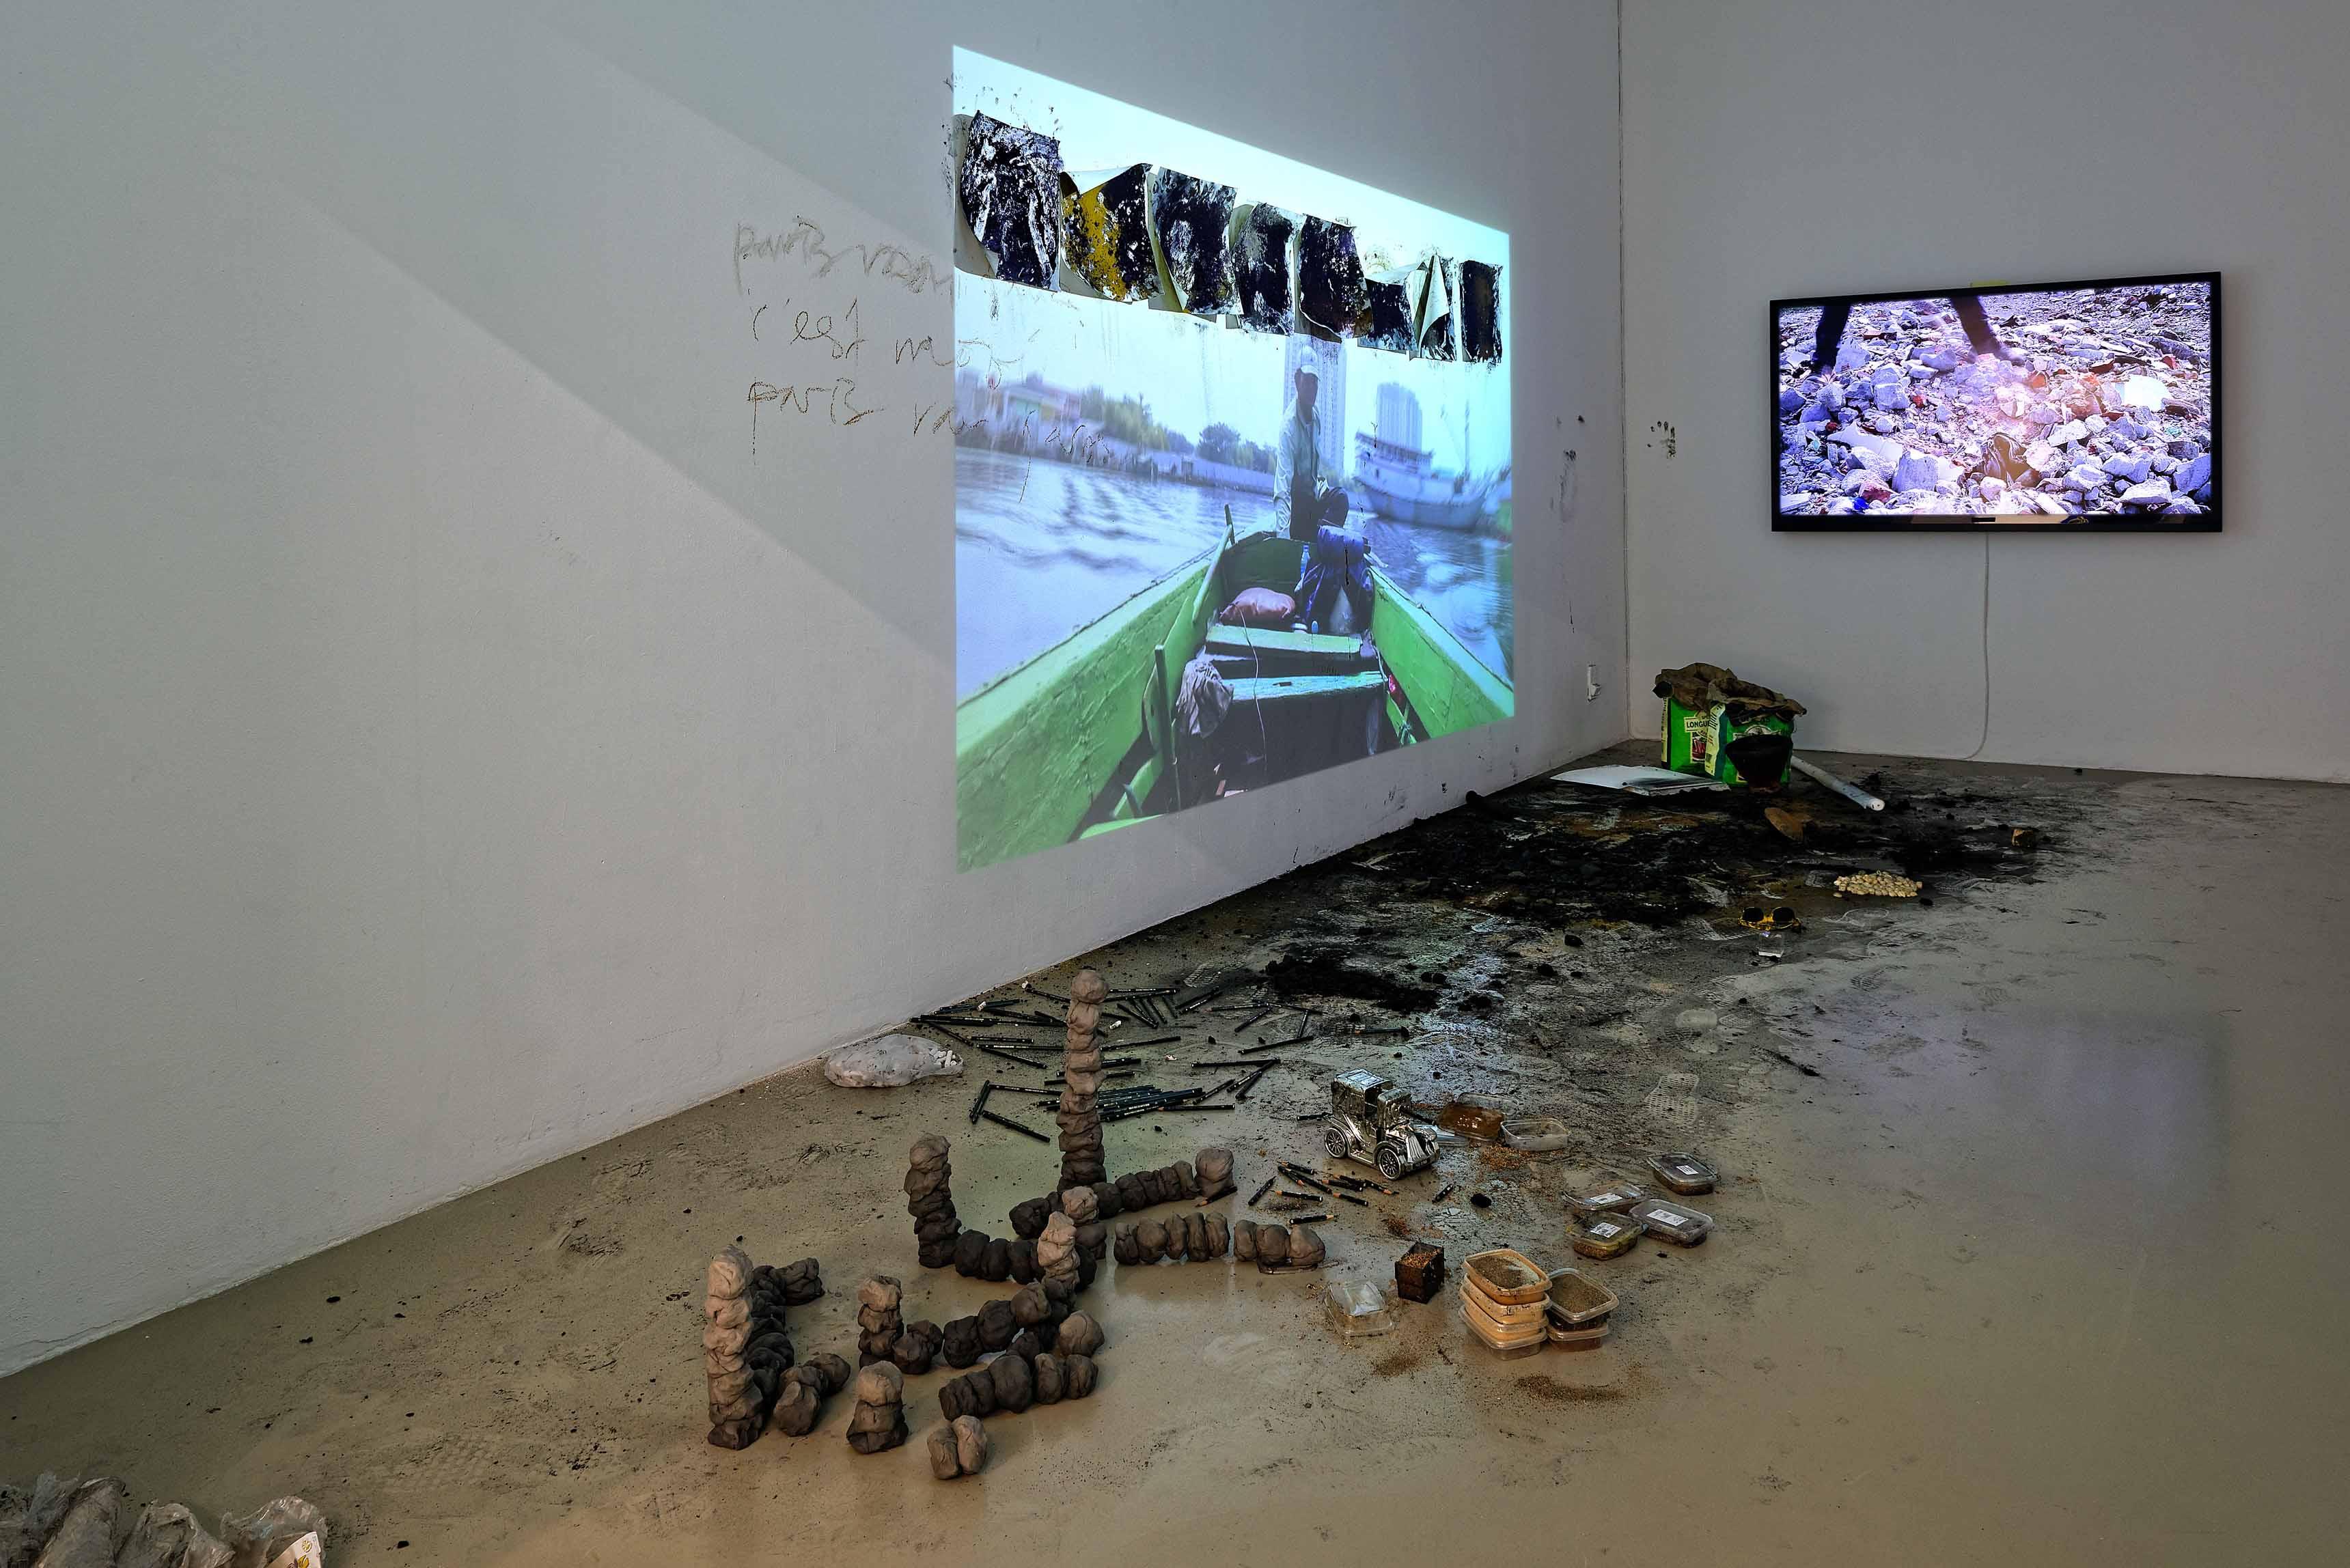 La 14e biennale de lyon for Biennale artisanat d art